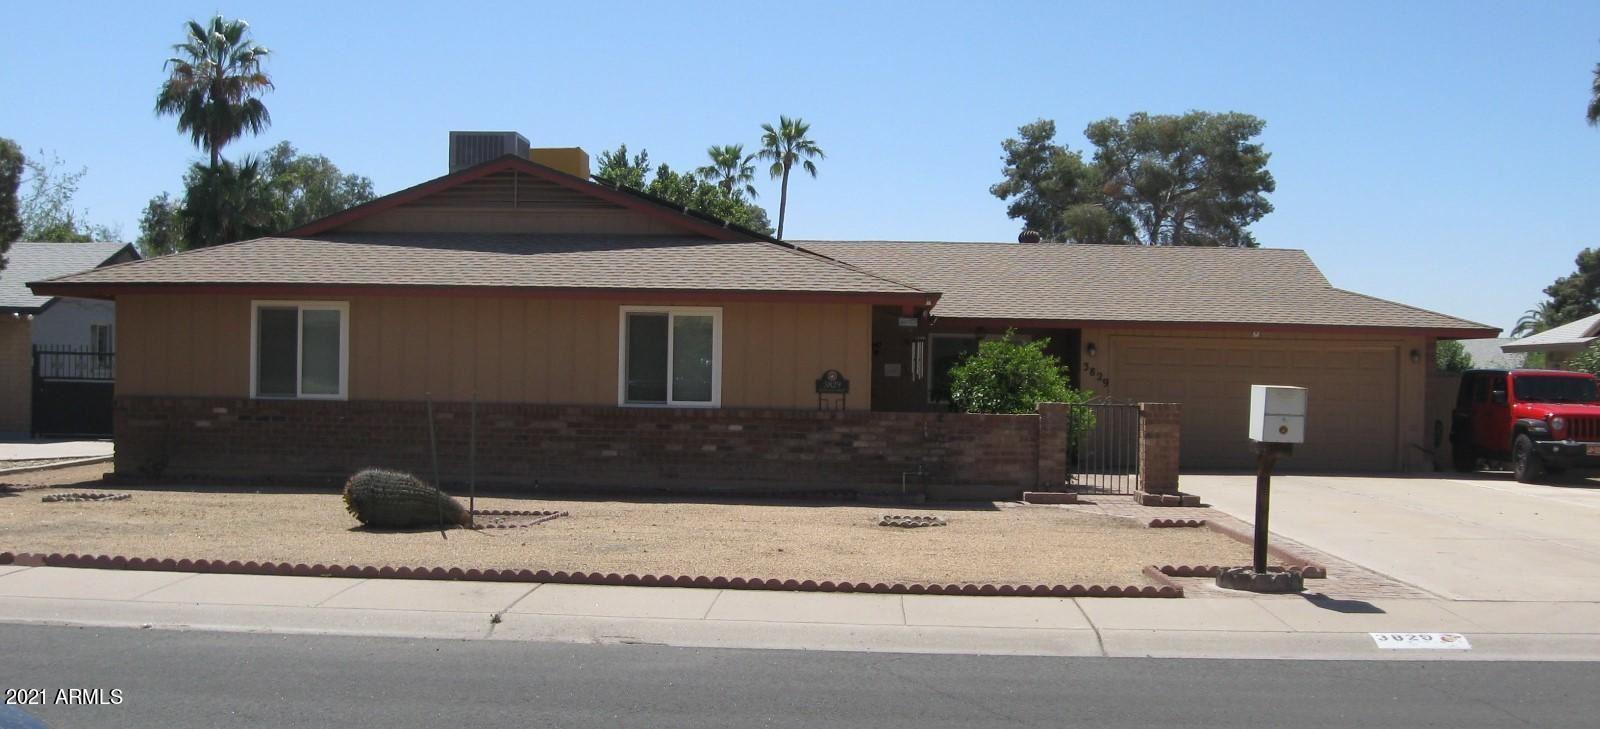 3829 W YUCCA Street, Phoenix, AZ 85029 - MLS#: 6222338